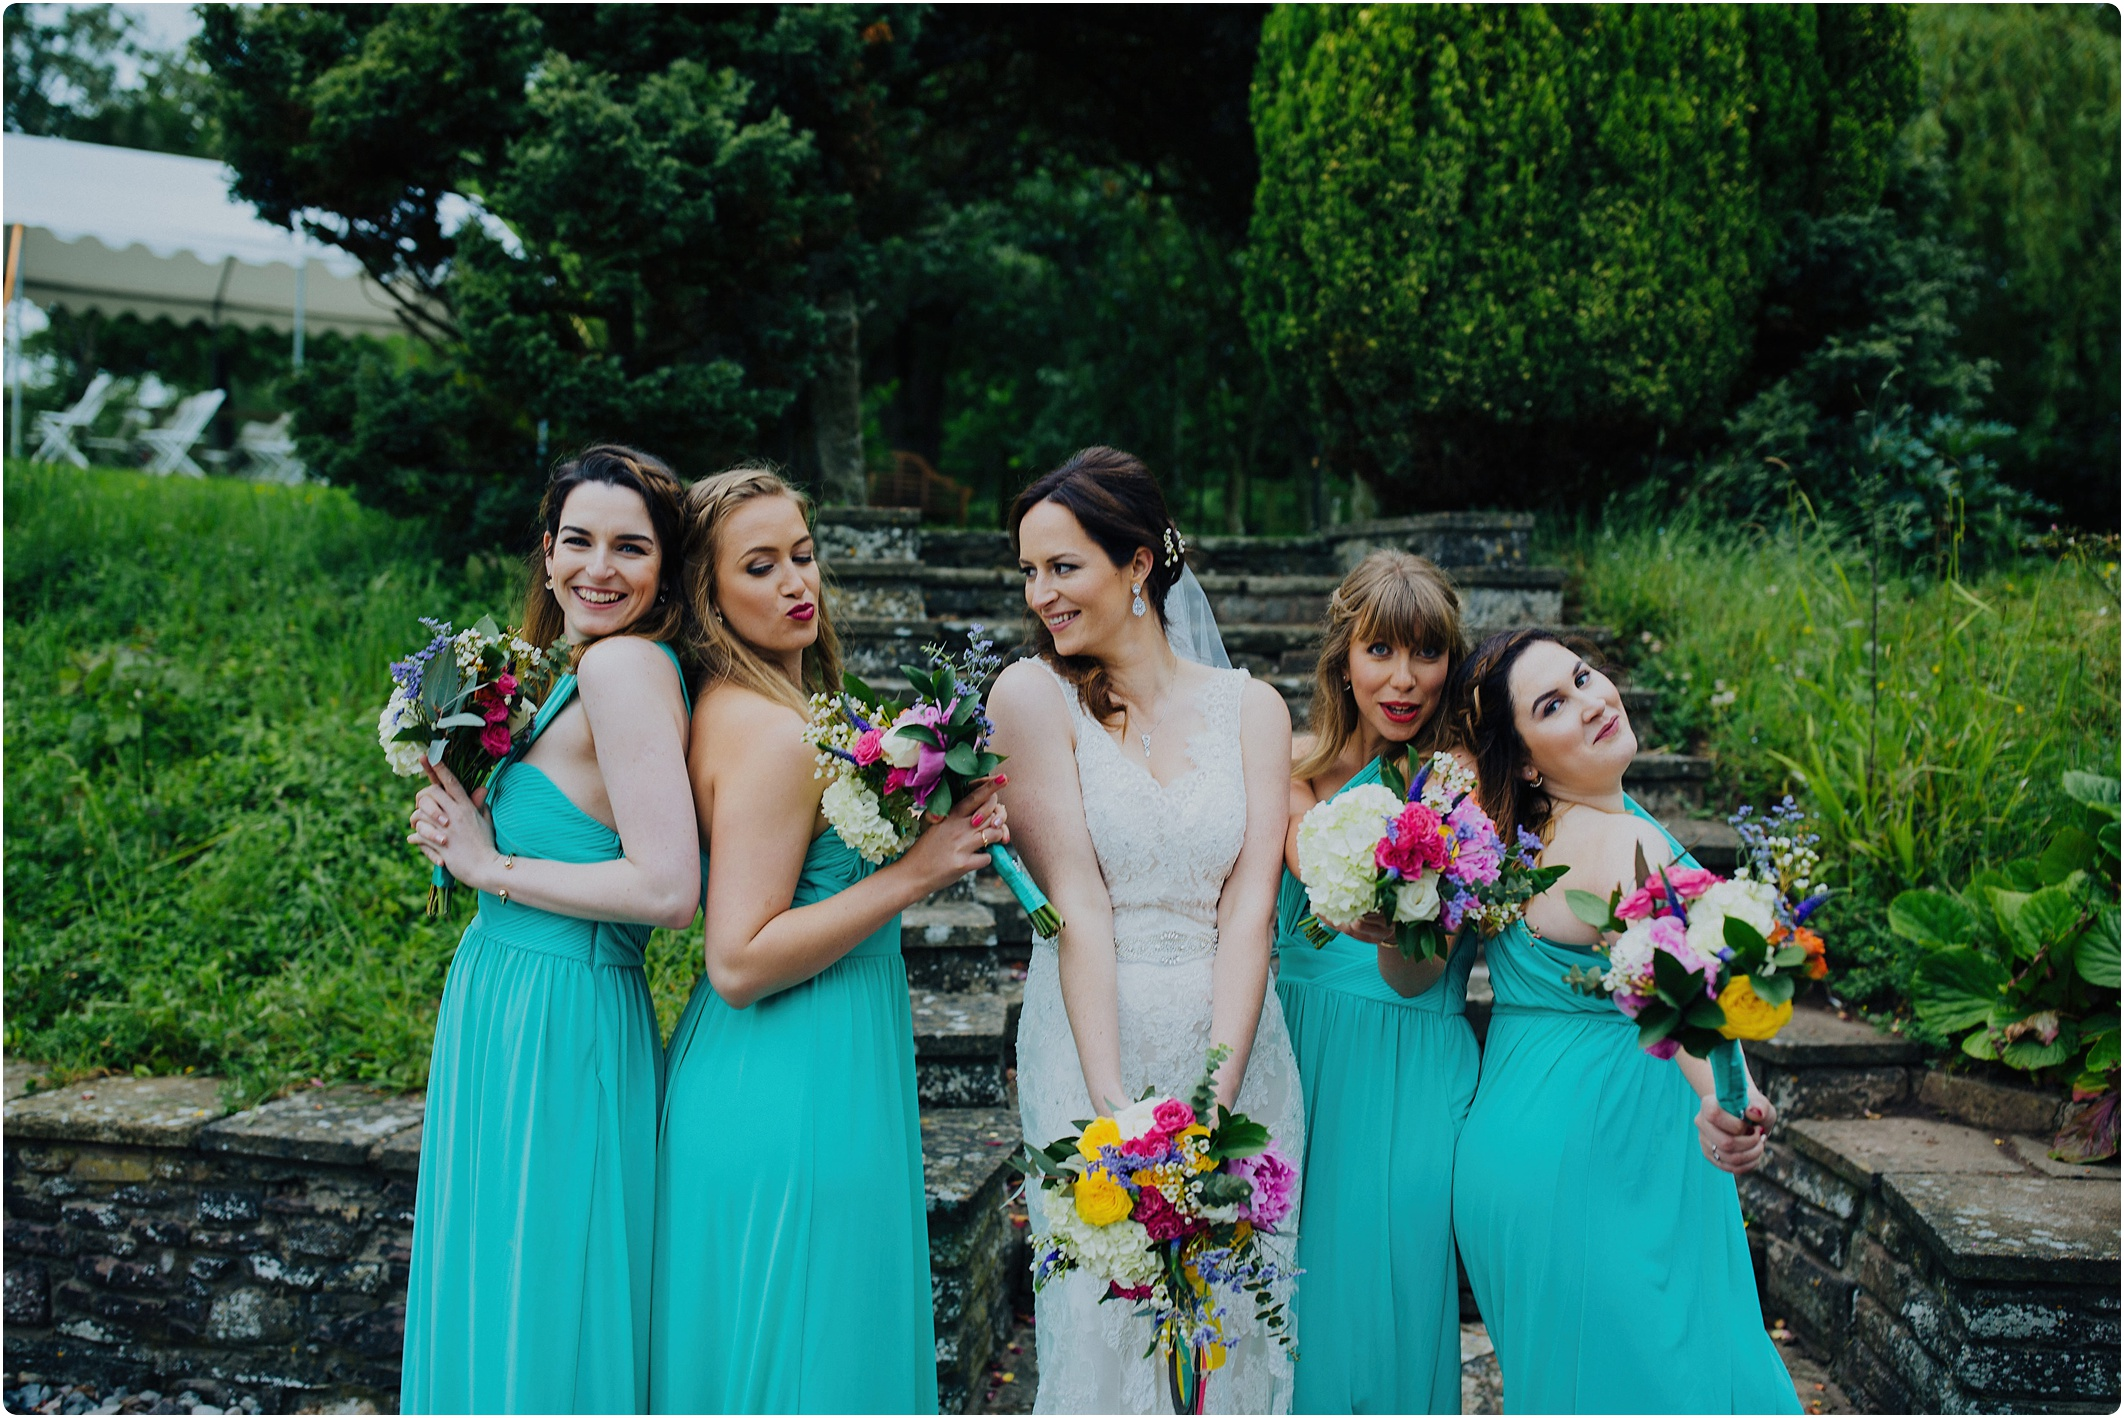 Treadam Barn Wedding bridesmaids